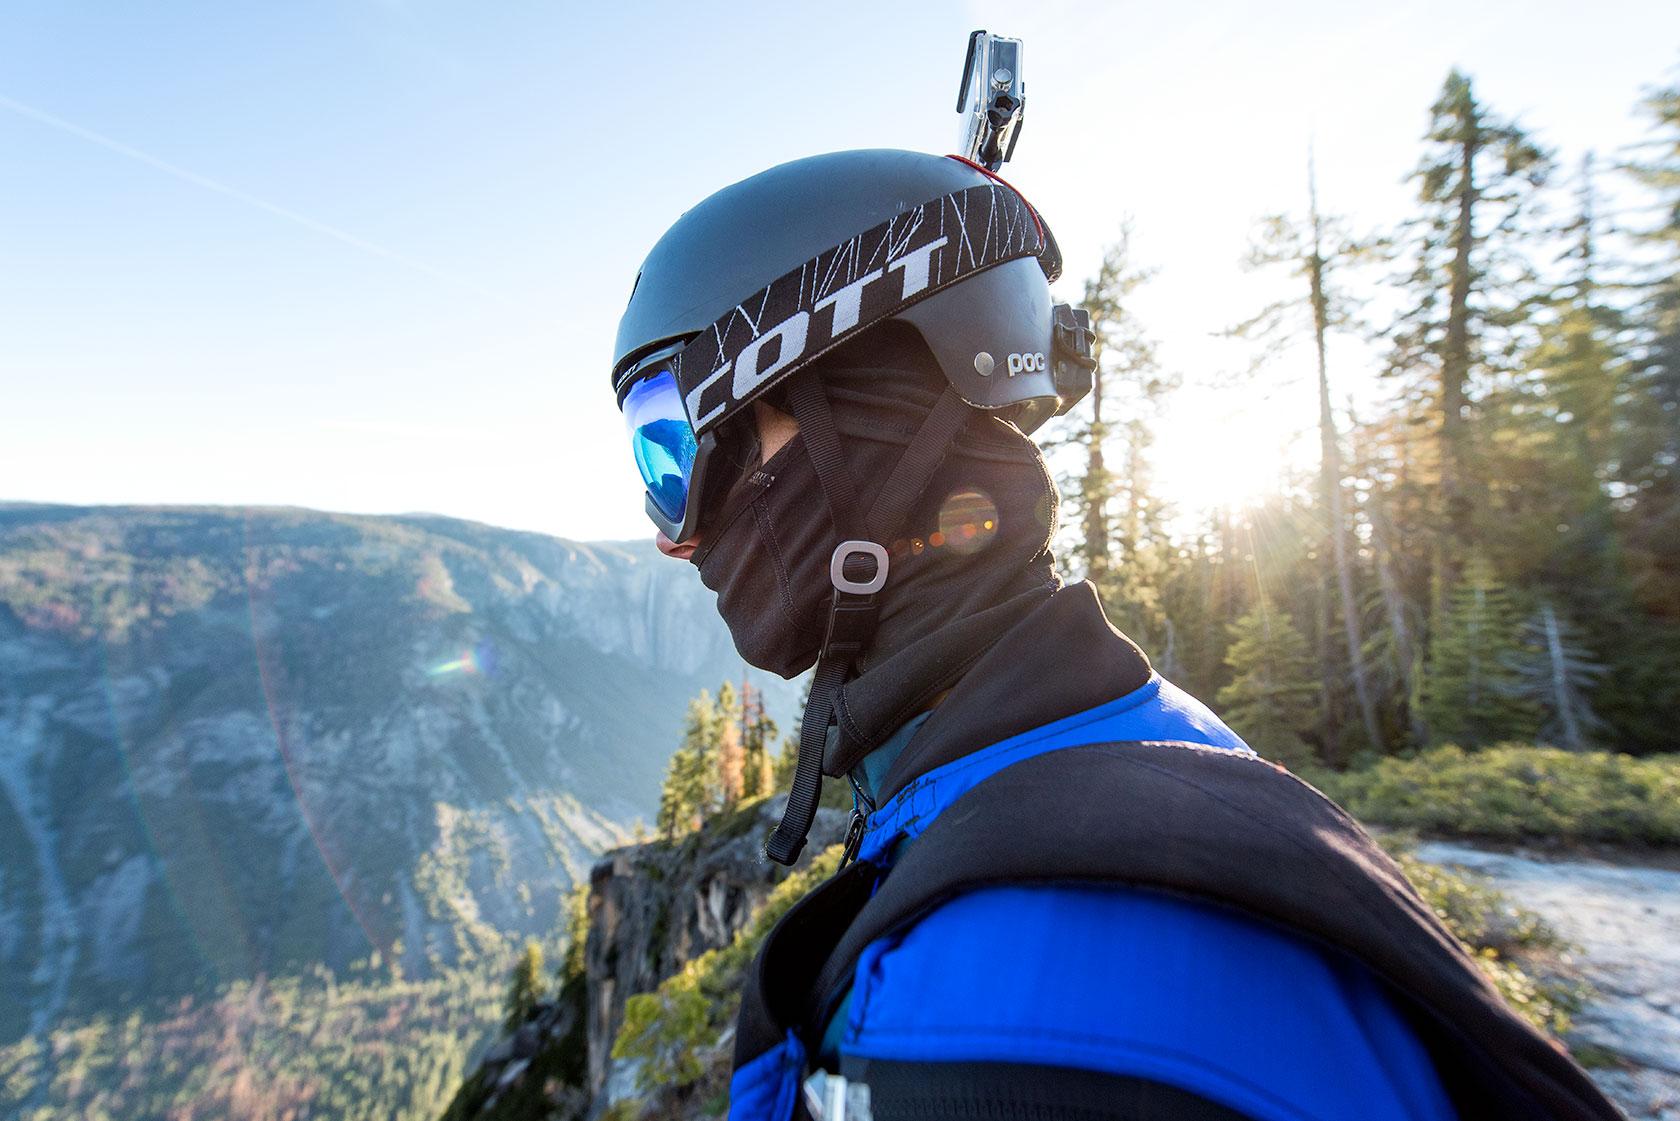 austin-trigg-wing-suit-base-jump-fly-yosemite-lifestyle-california-adventure-thrill-seeking-portrait-waterfall.jpg